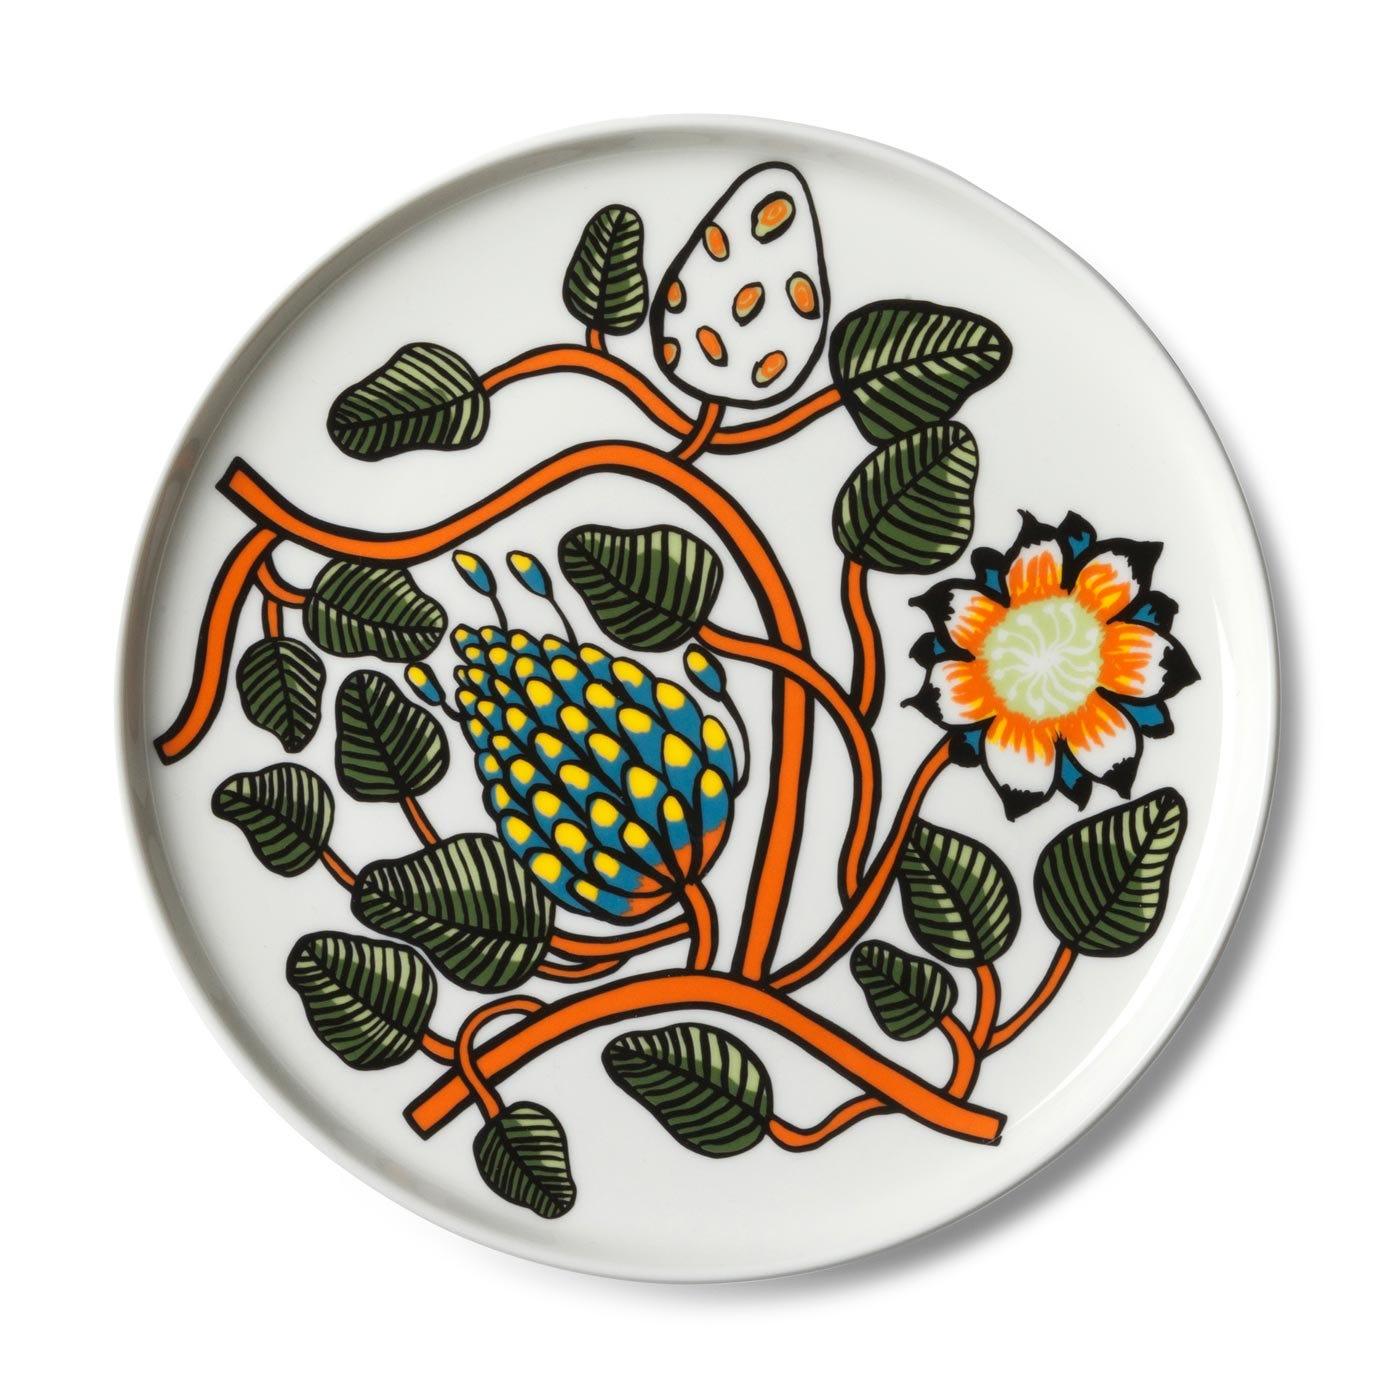 Tiara Plate